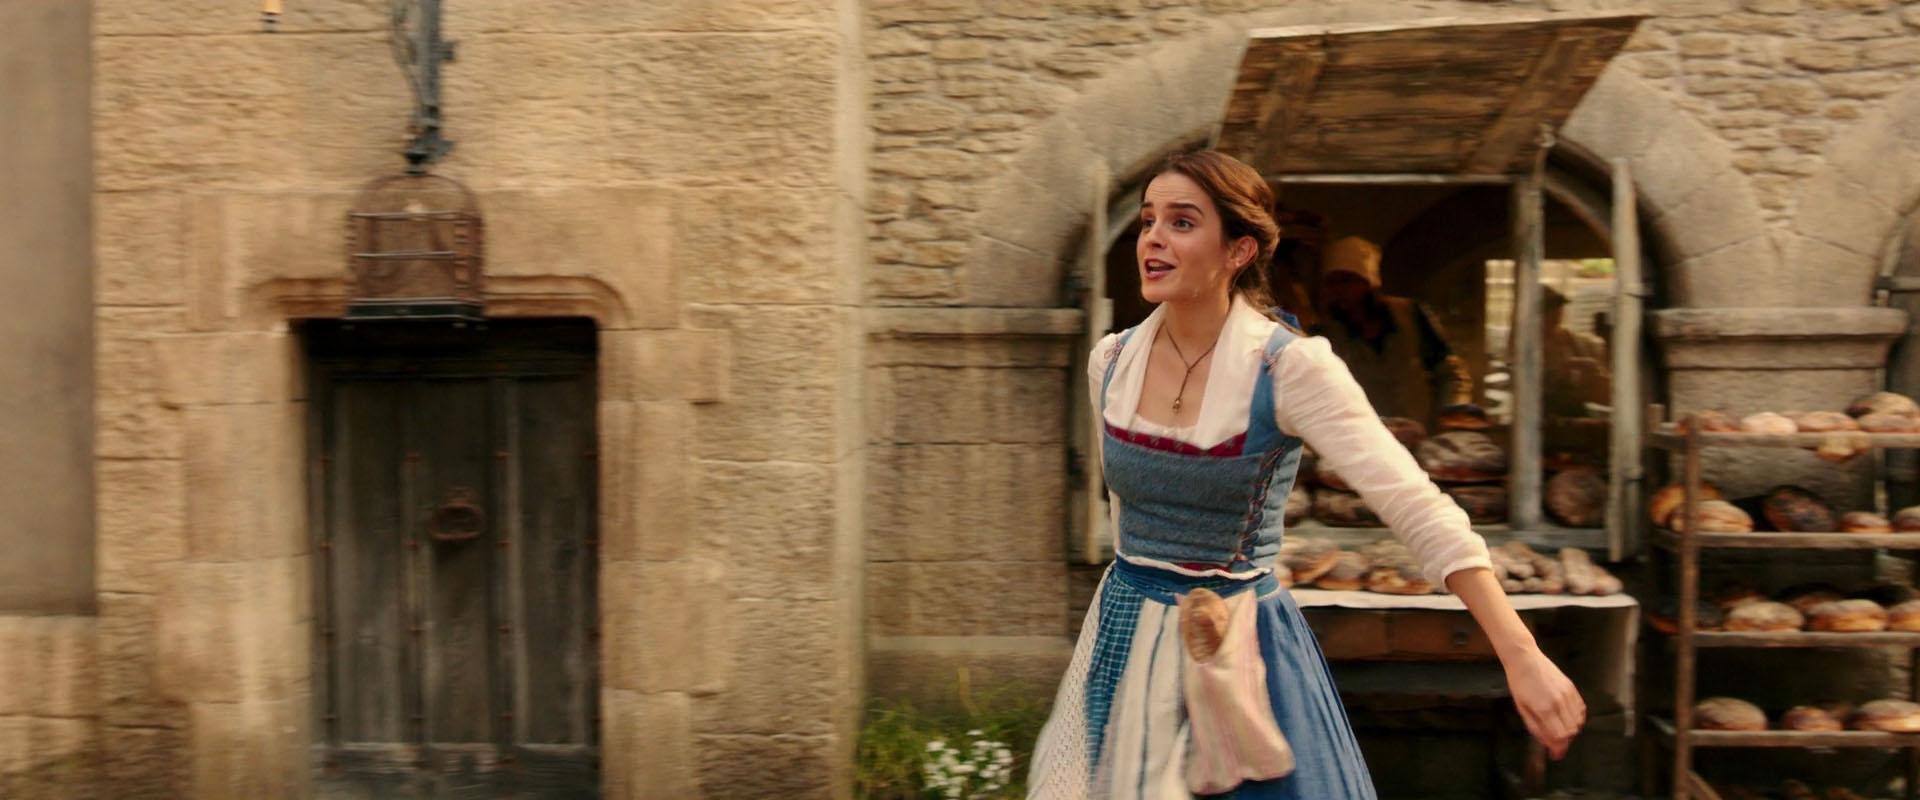 Emma Watson as Belle in a scene from the movie